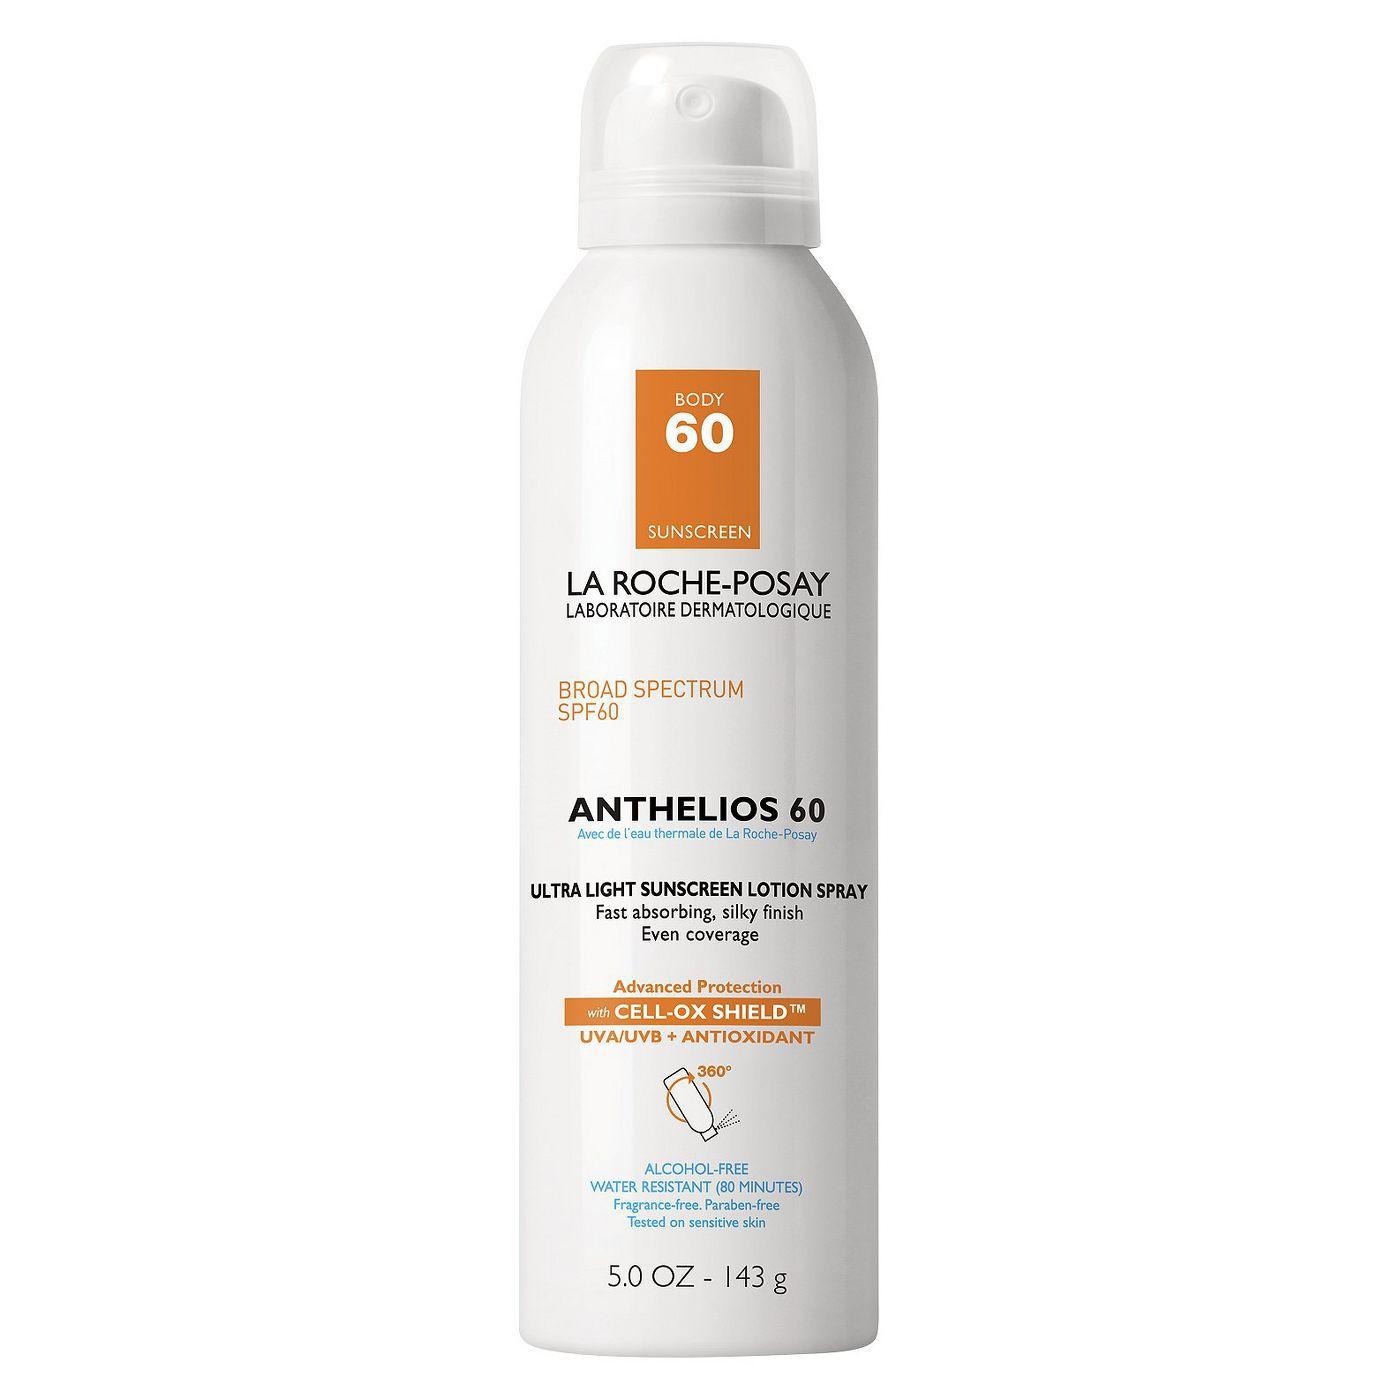 La Roche Posay Anthelios Ultra Light Sunscreen Spray Lotion